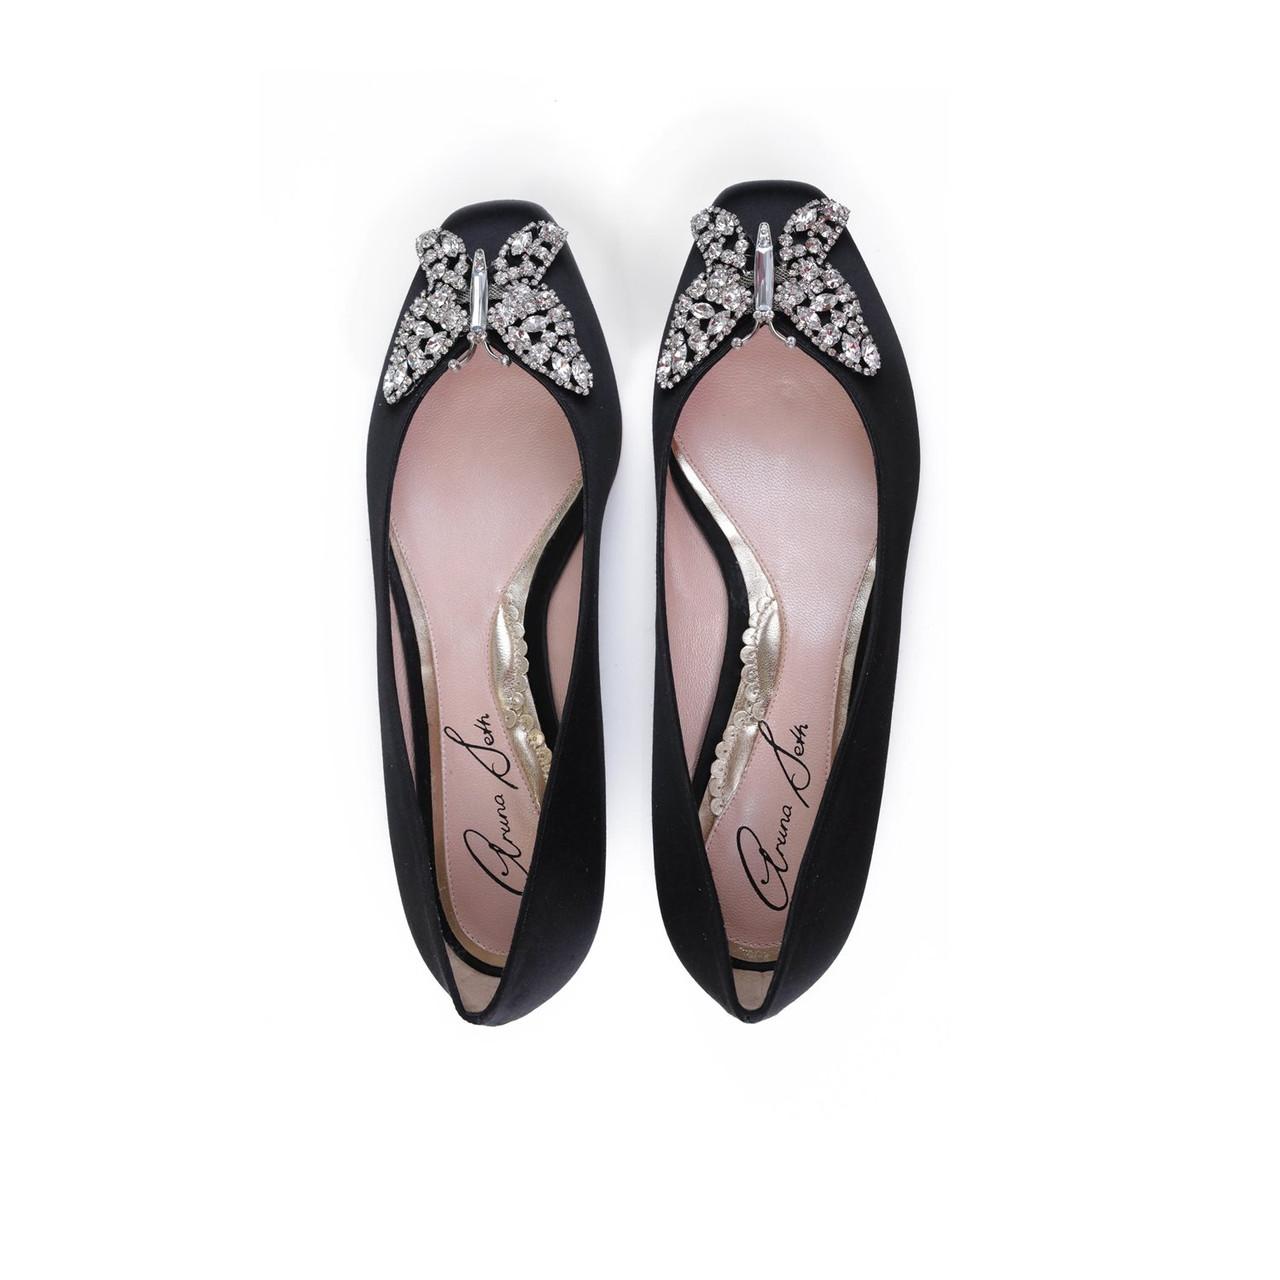 Carrie Ballerina Flat Black Satin